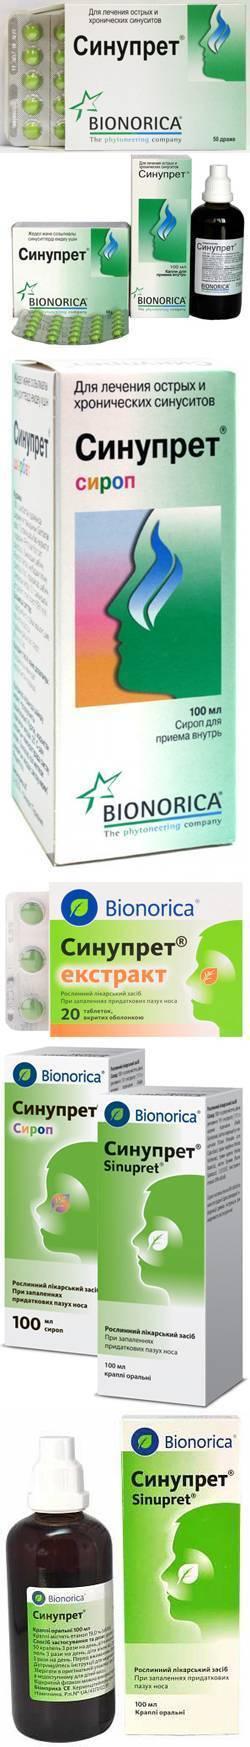 Капли синупрет: инструкция по применению для детей, прием сиропа и таблеток, аналоги препарата